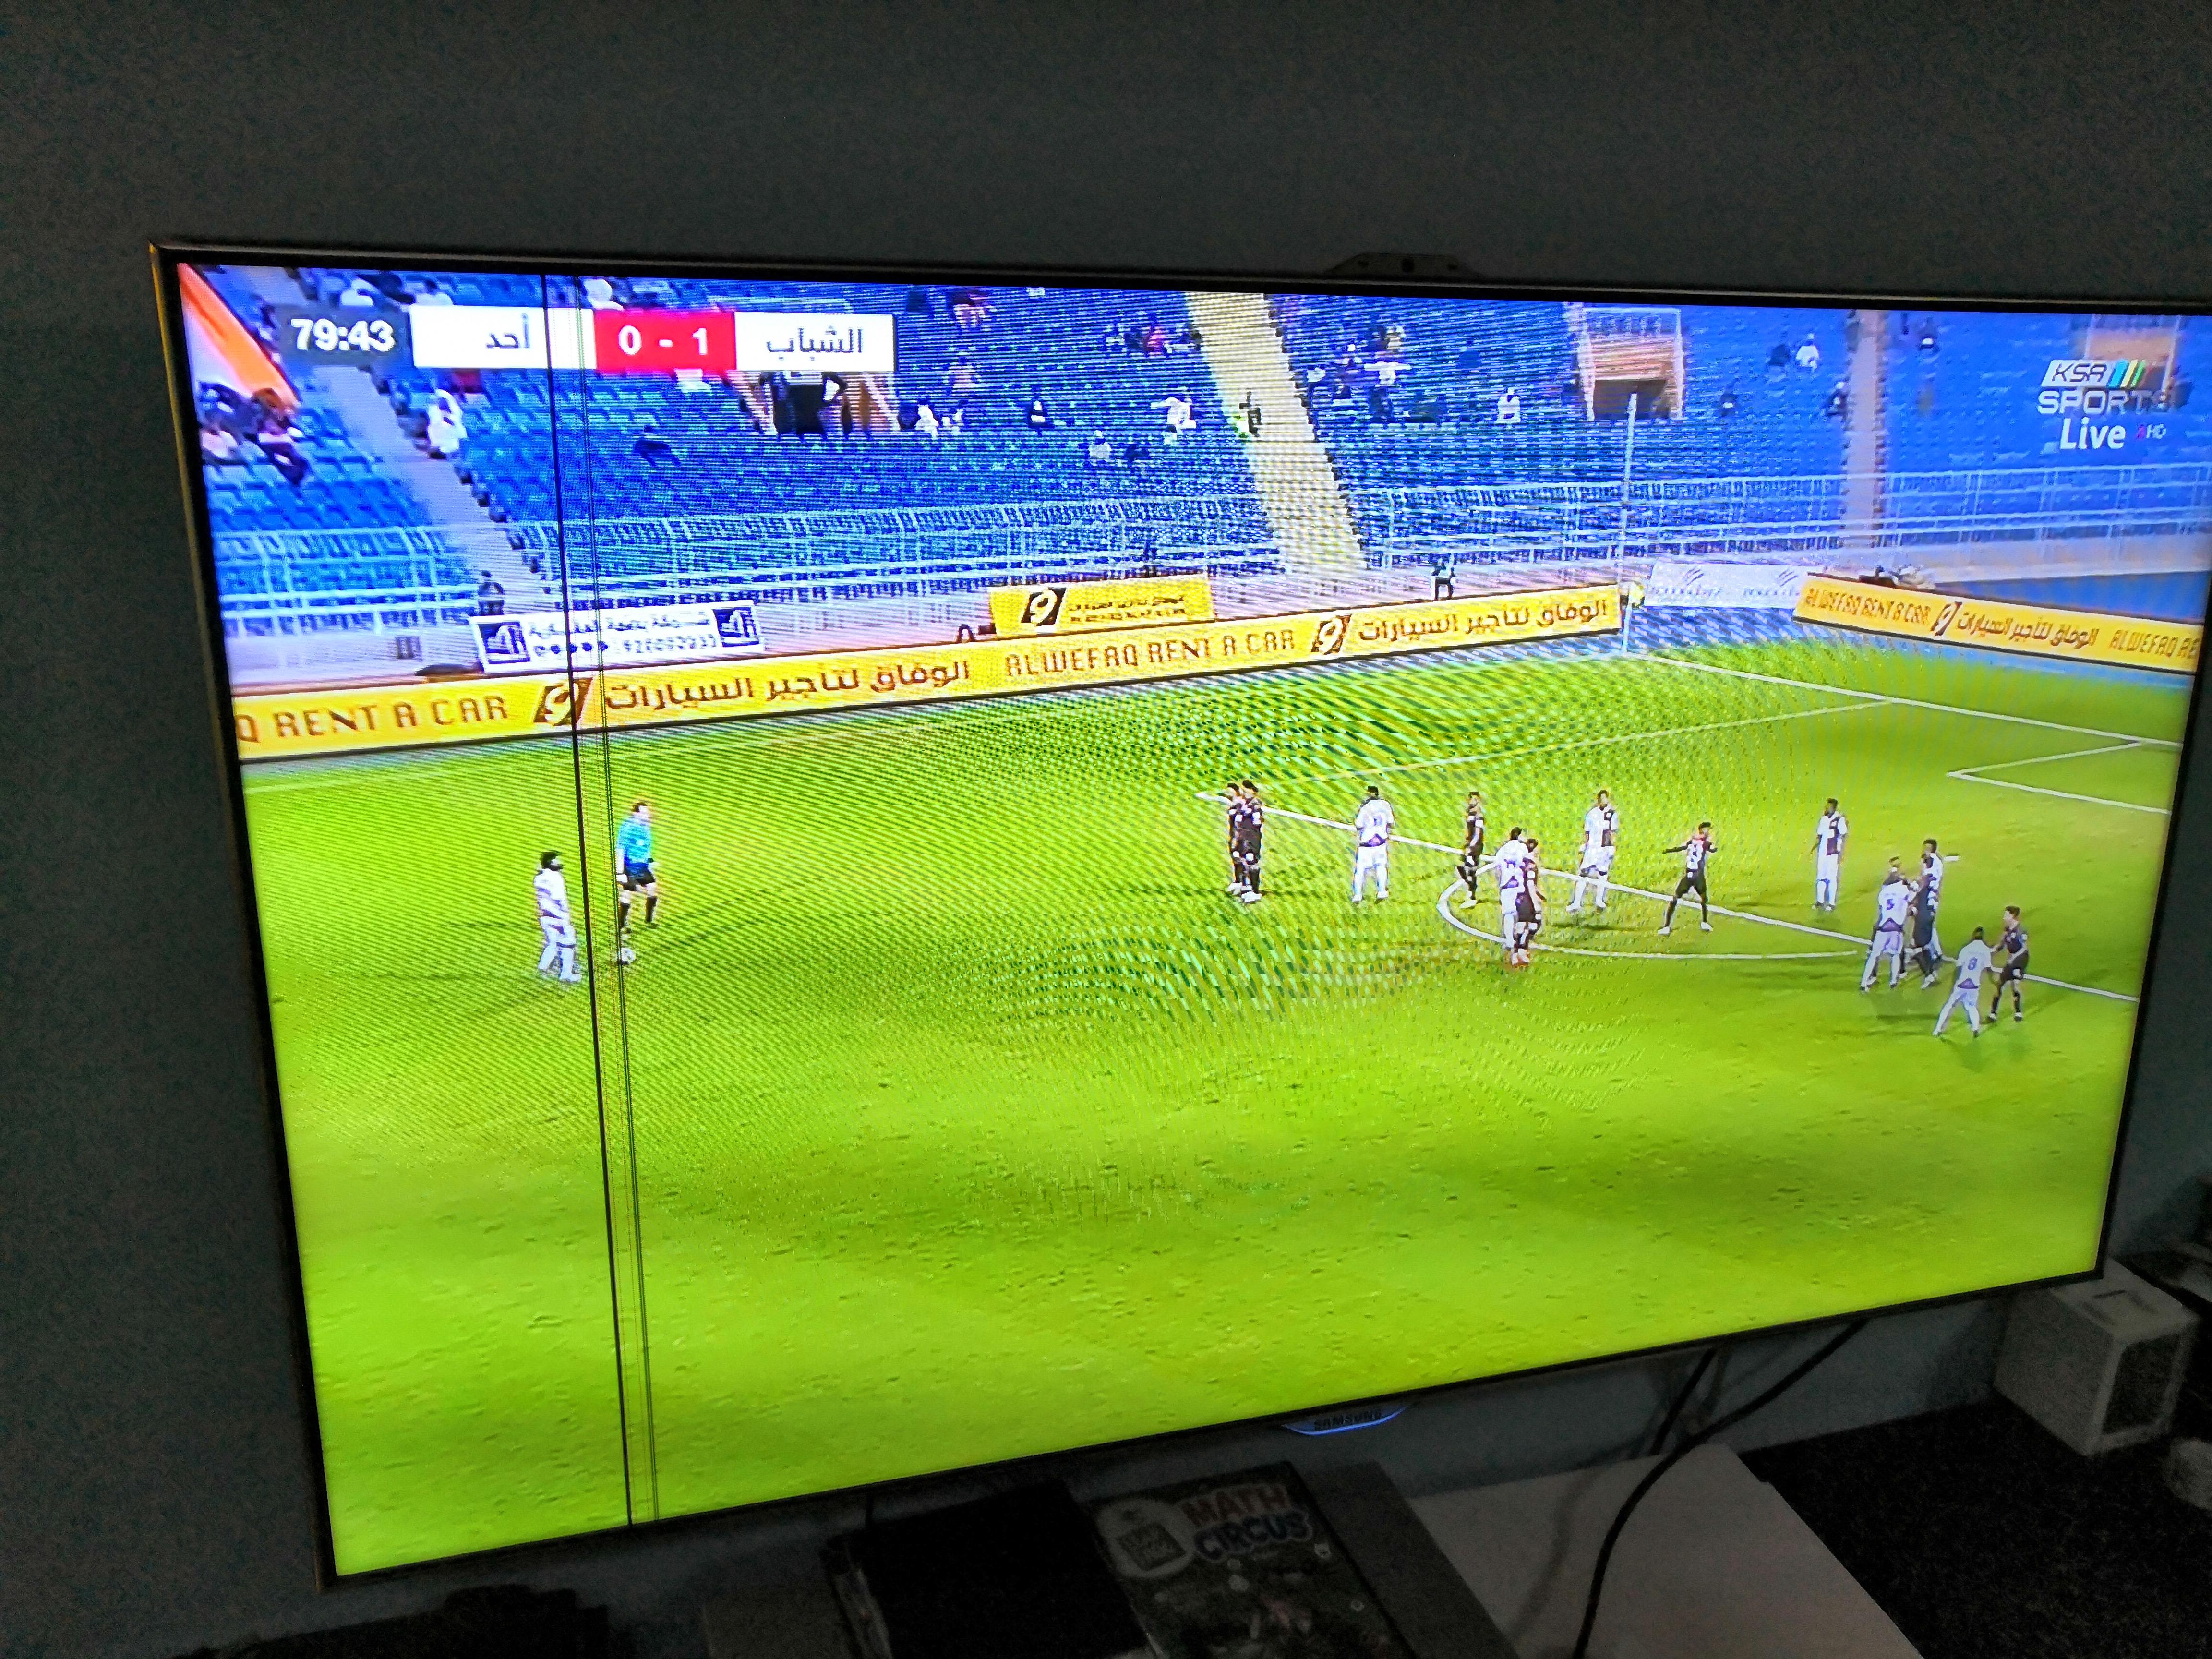 LG OLED 55 Inch 4K Smart Tv-55CX (2020)-  تلفزيون سامسونج سمارت HD...